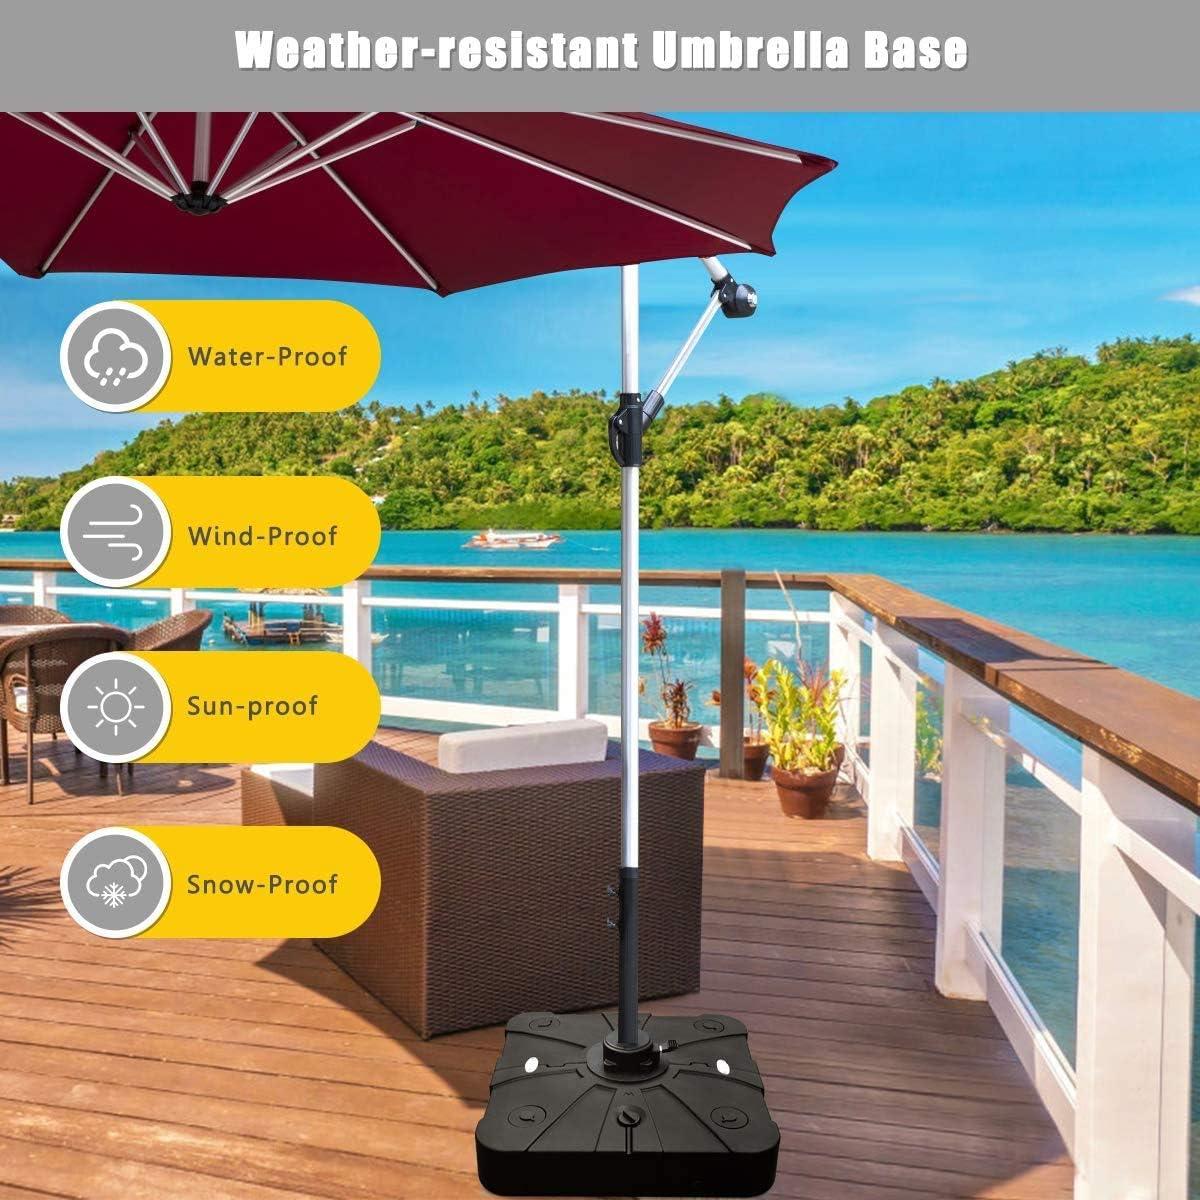 Giantex 260lbs Offset Patio Umbrella Base with Wheels, Water Sand Filled Square Umbrella Base Stand for Cantilever Umbrella, Cantilever Base Weight with Crossbar